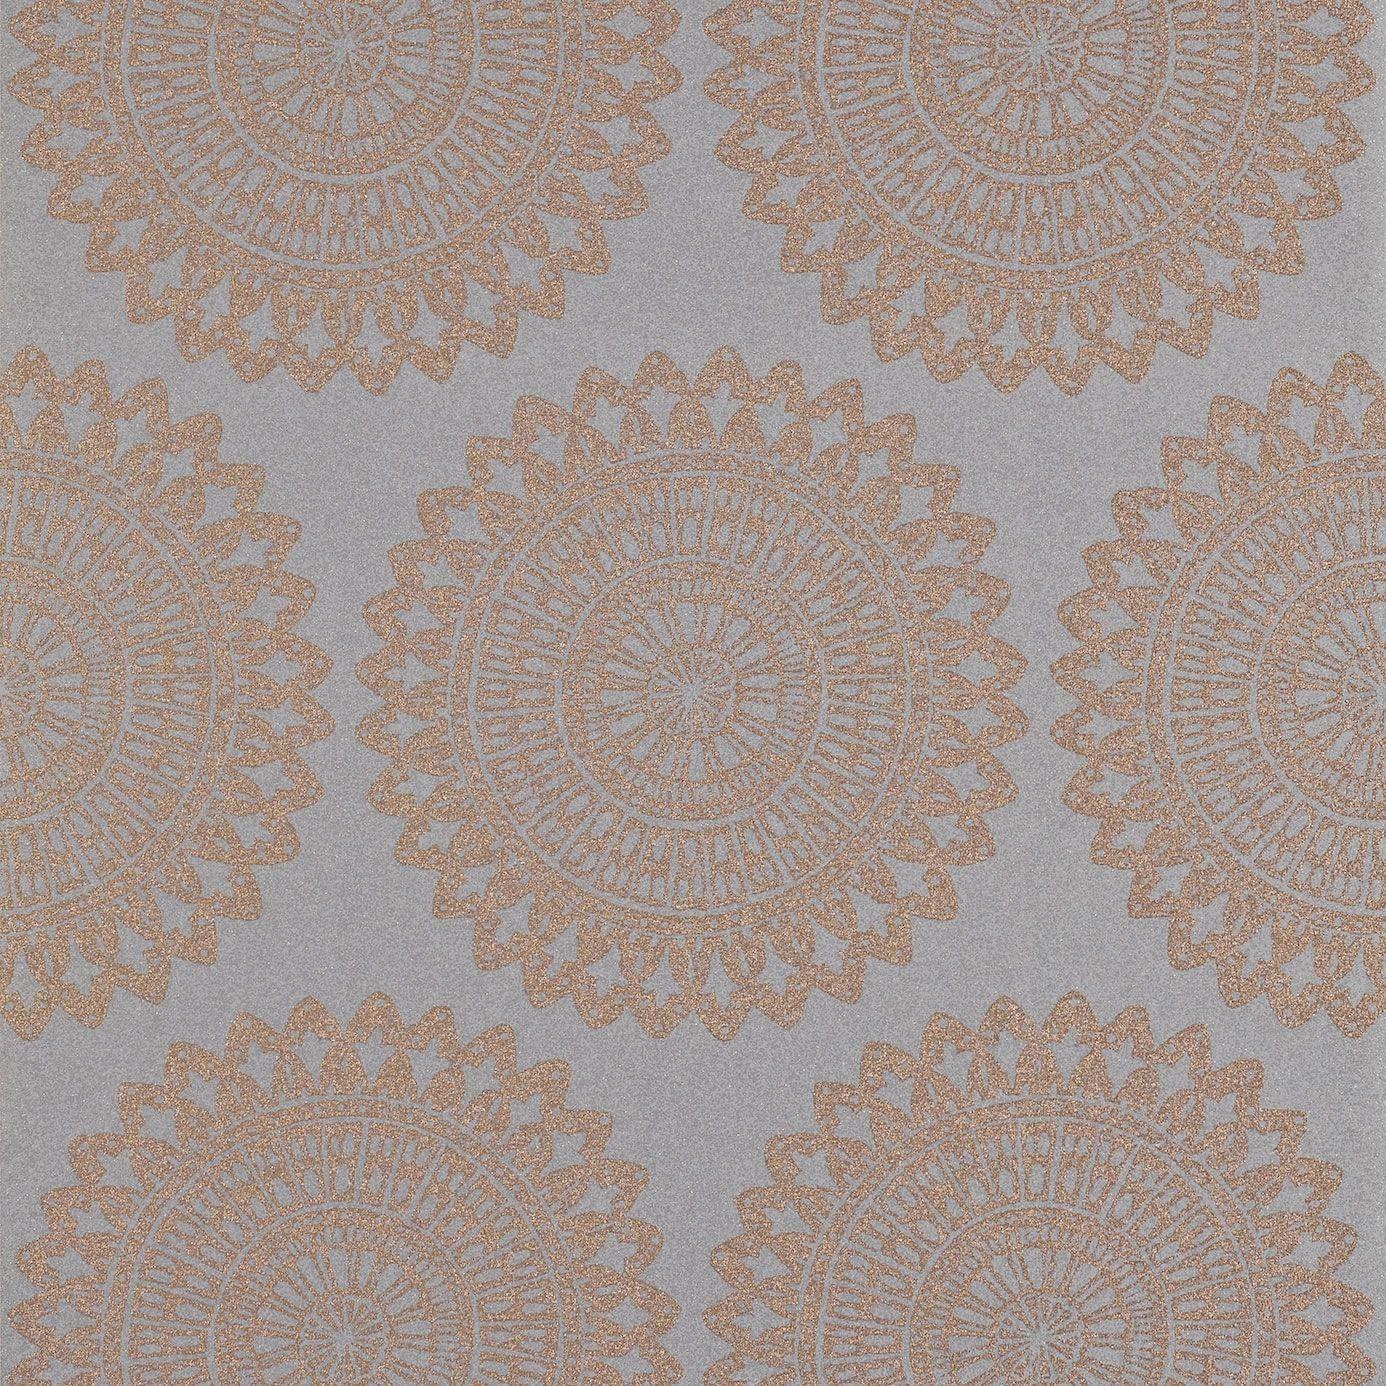 Copper Grey   110628   Medina   Leonida   Harlequin Wallpaper 1386x1386